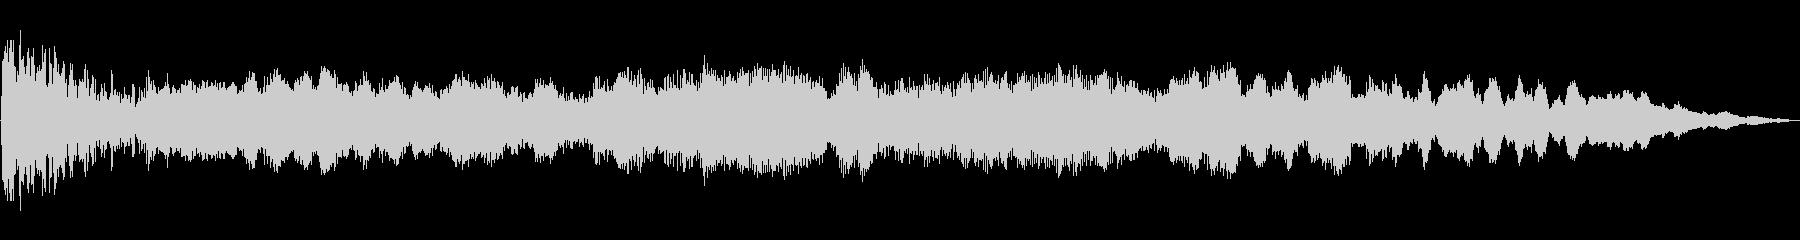 PEARLY GATEロゴの未再生の波形